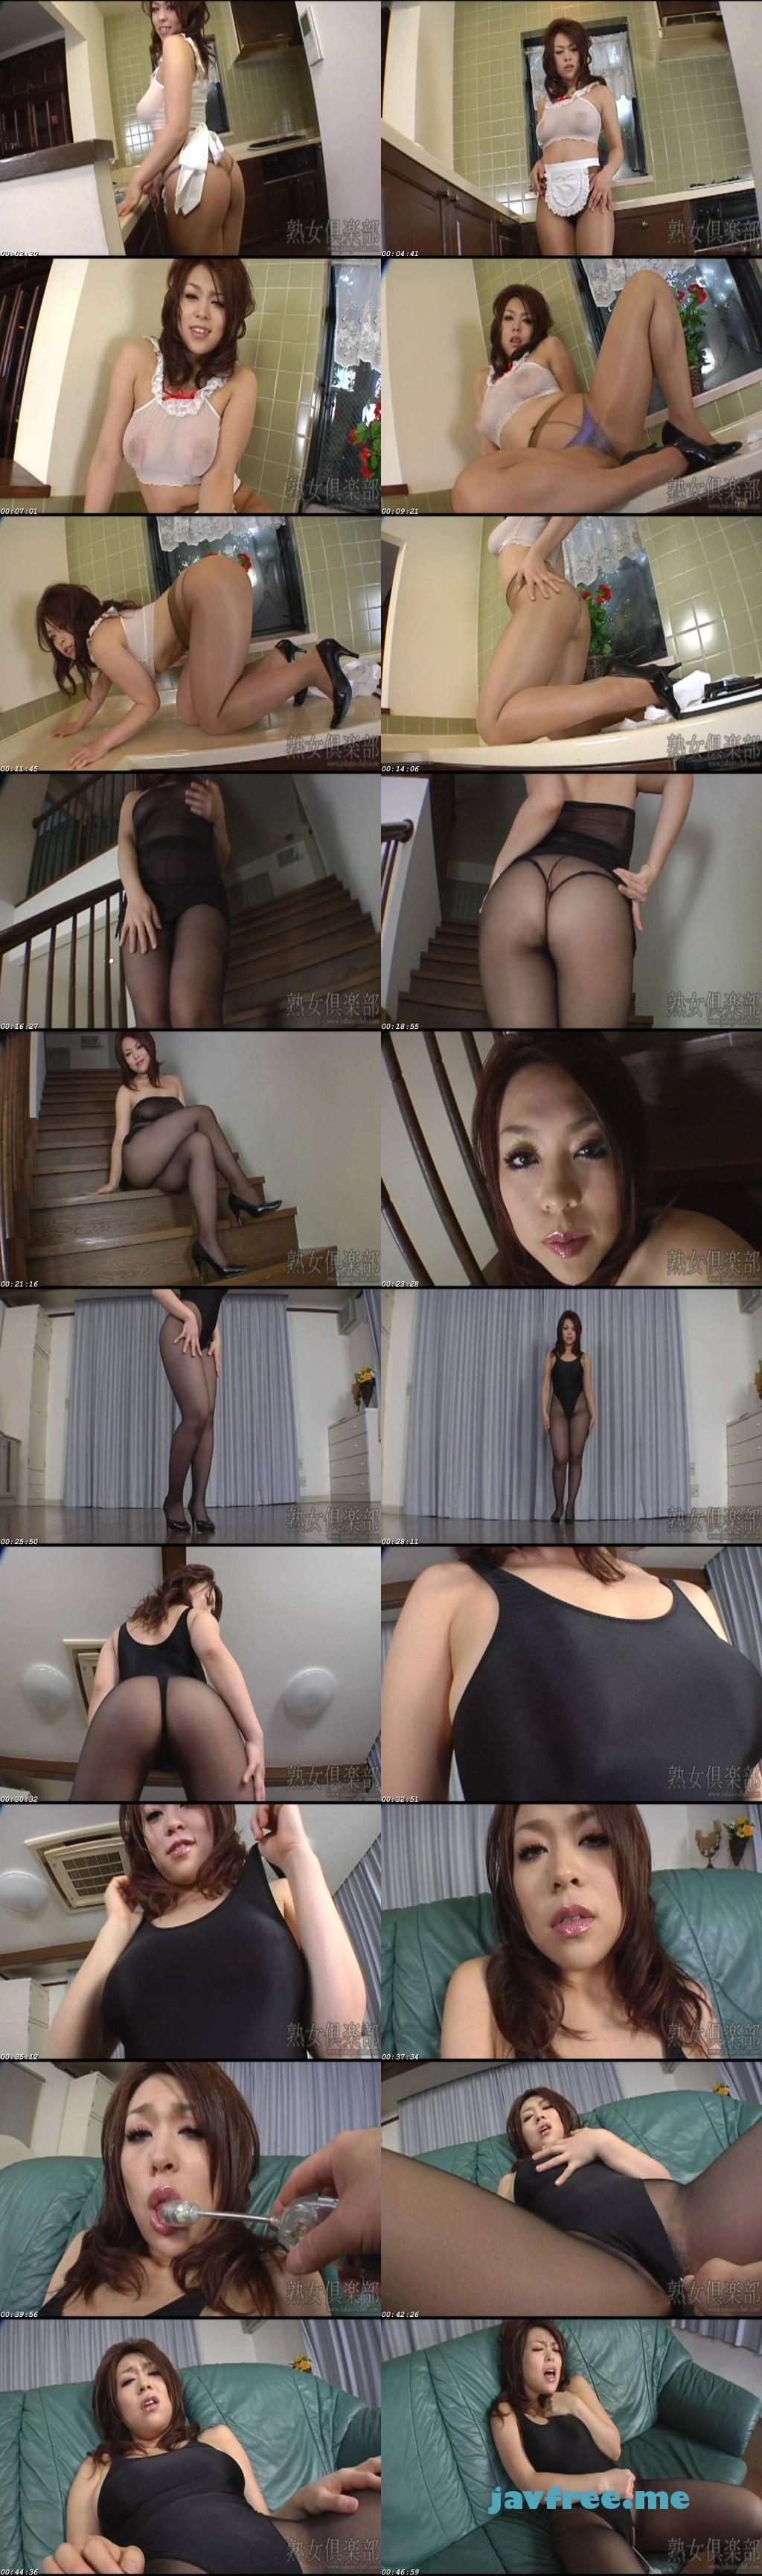 Jukujo club 4099 着エロ美熟女 中森玲子 第2話 熟女倶楽部 中森玲子 Jukujo club